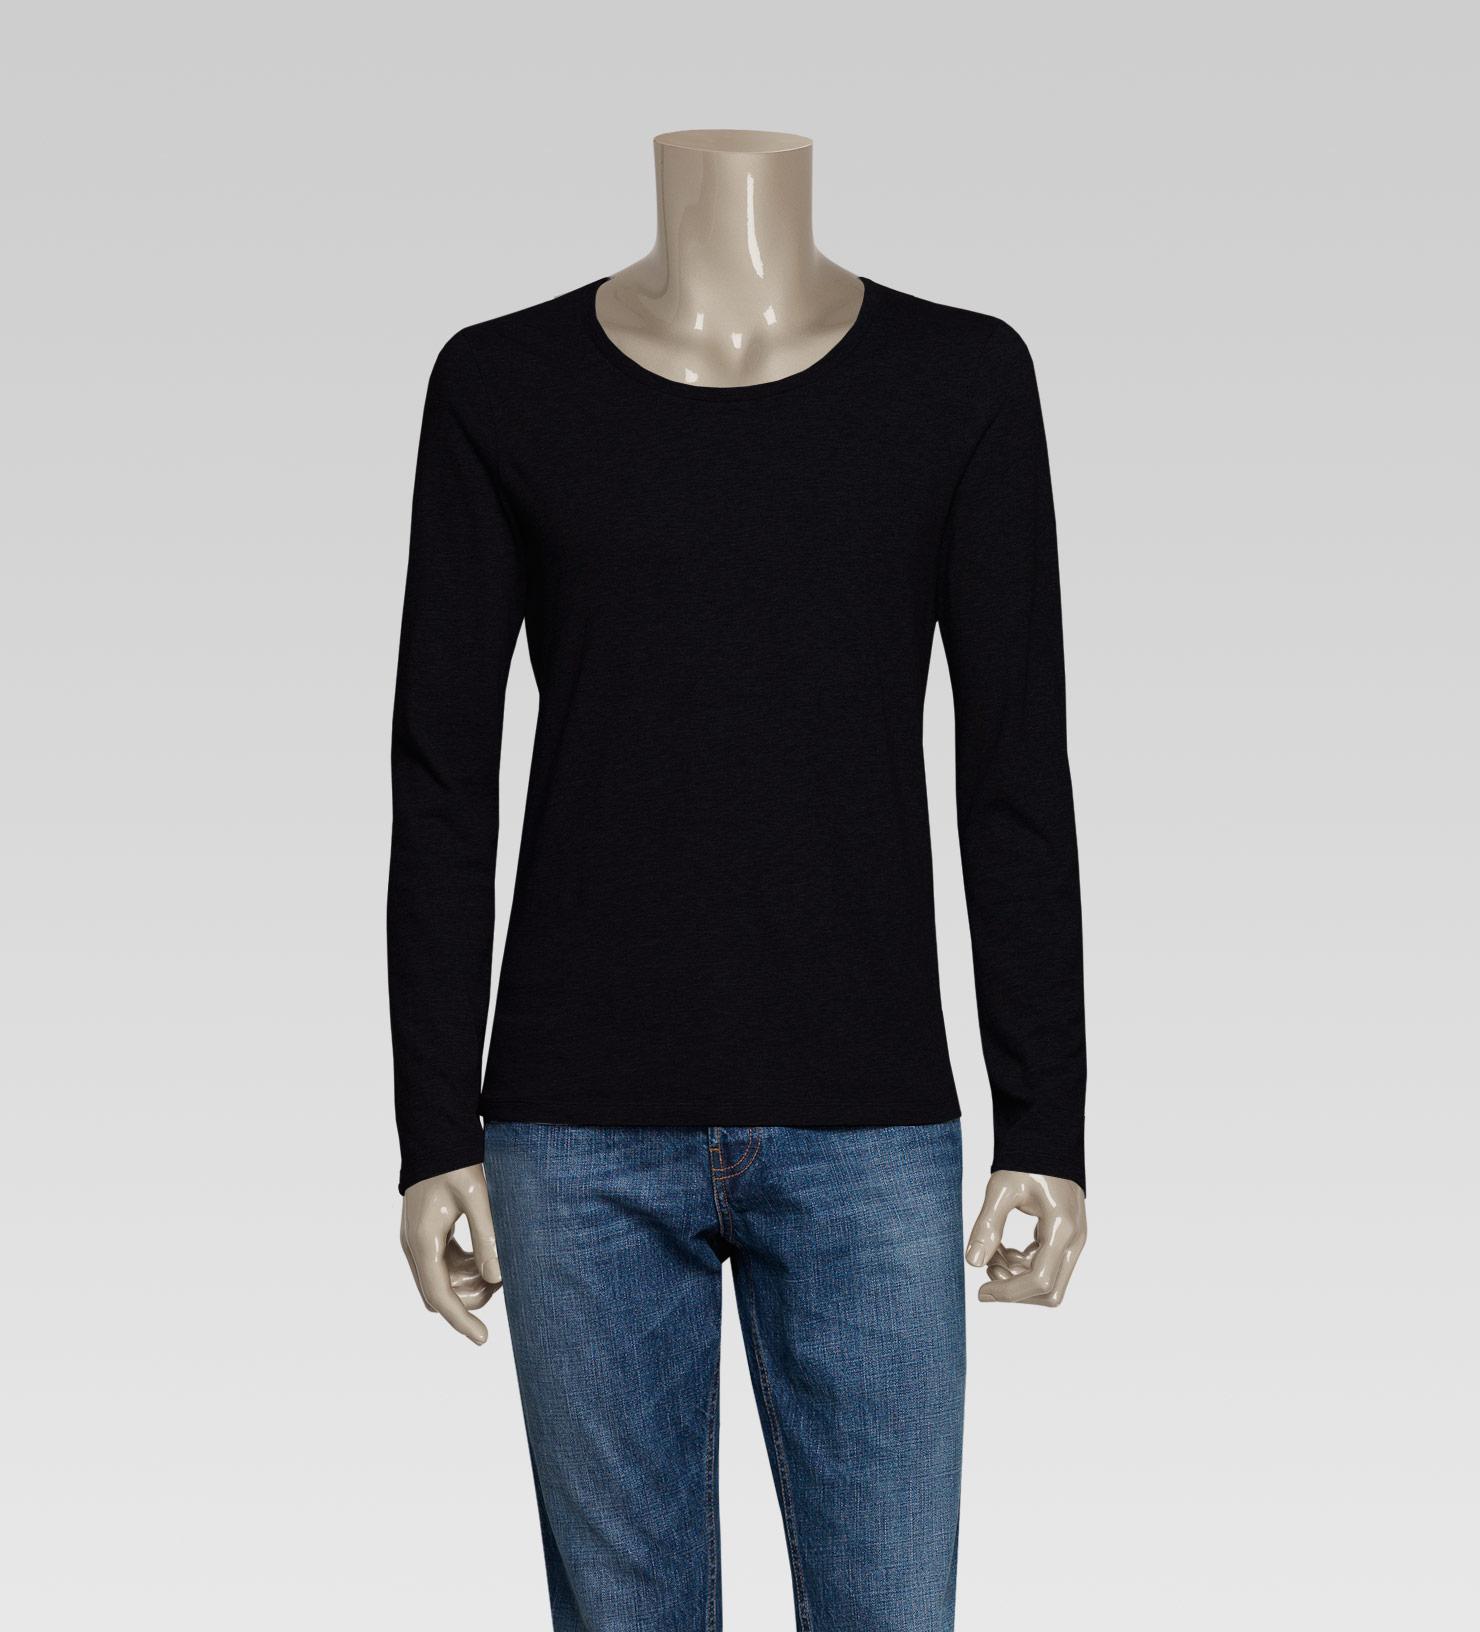 324cc682 Men's Black Gucci Trademark Long Sleeve Tshirt